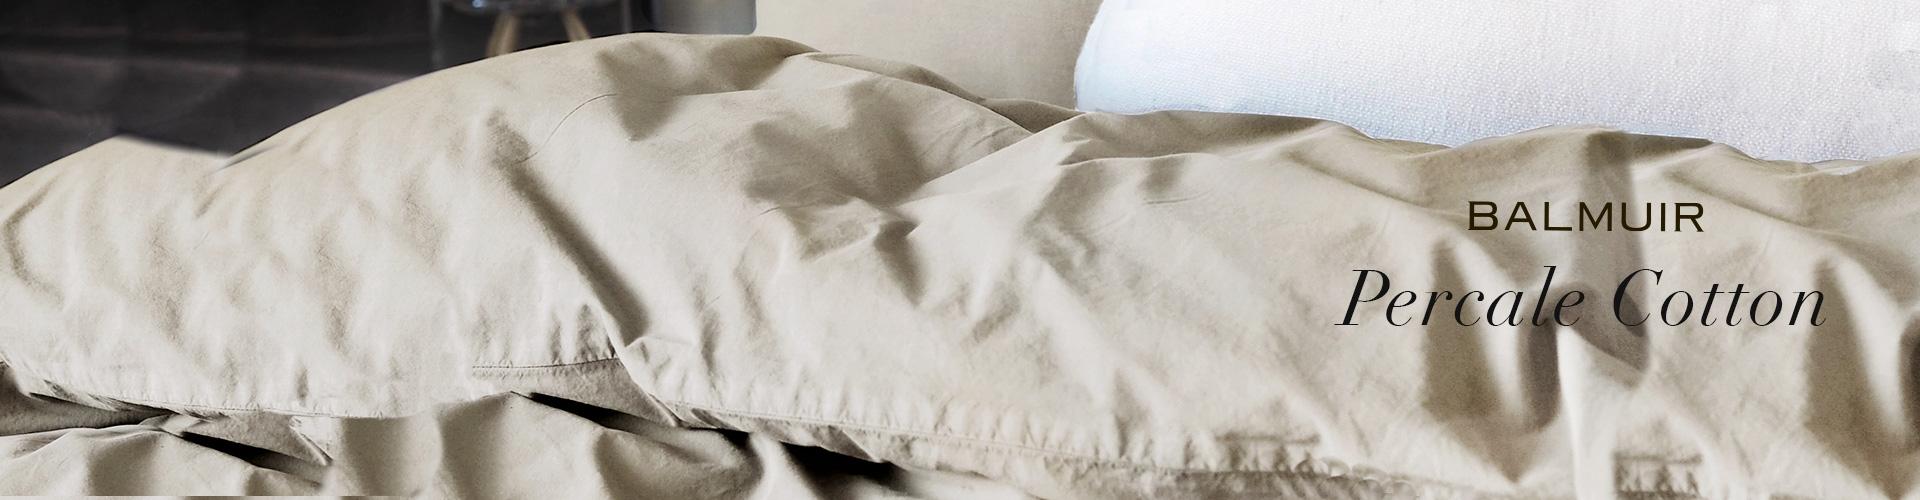 Percale Cotton